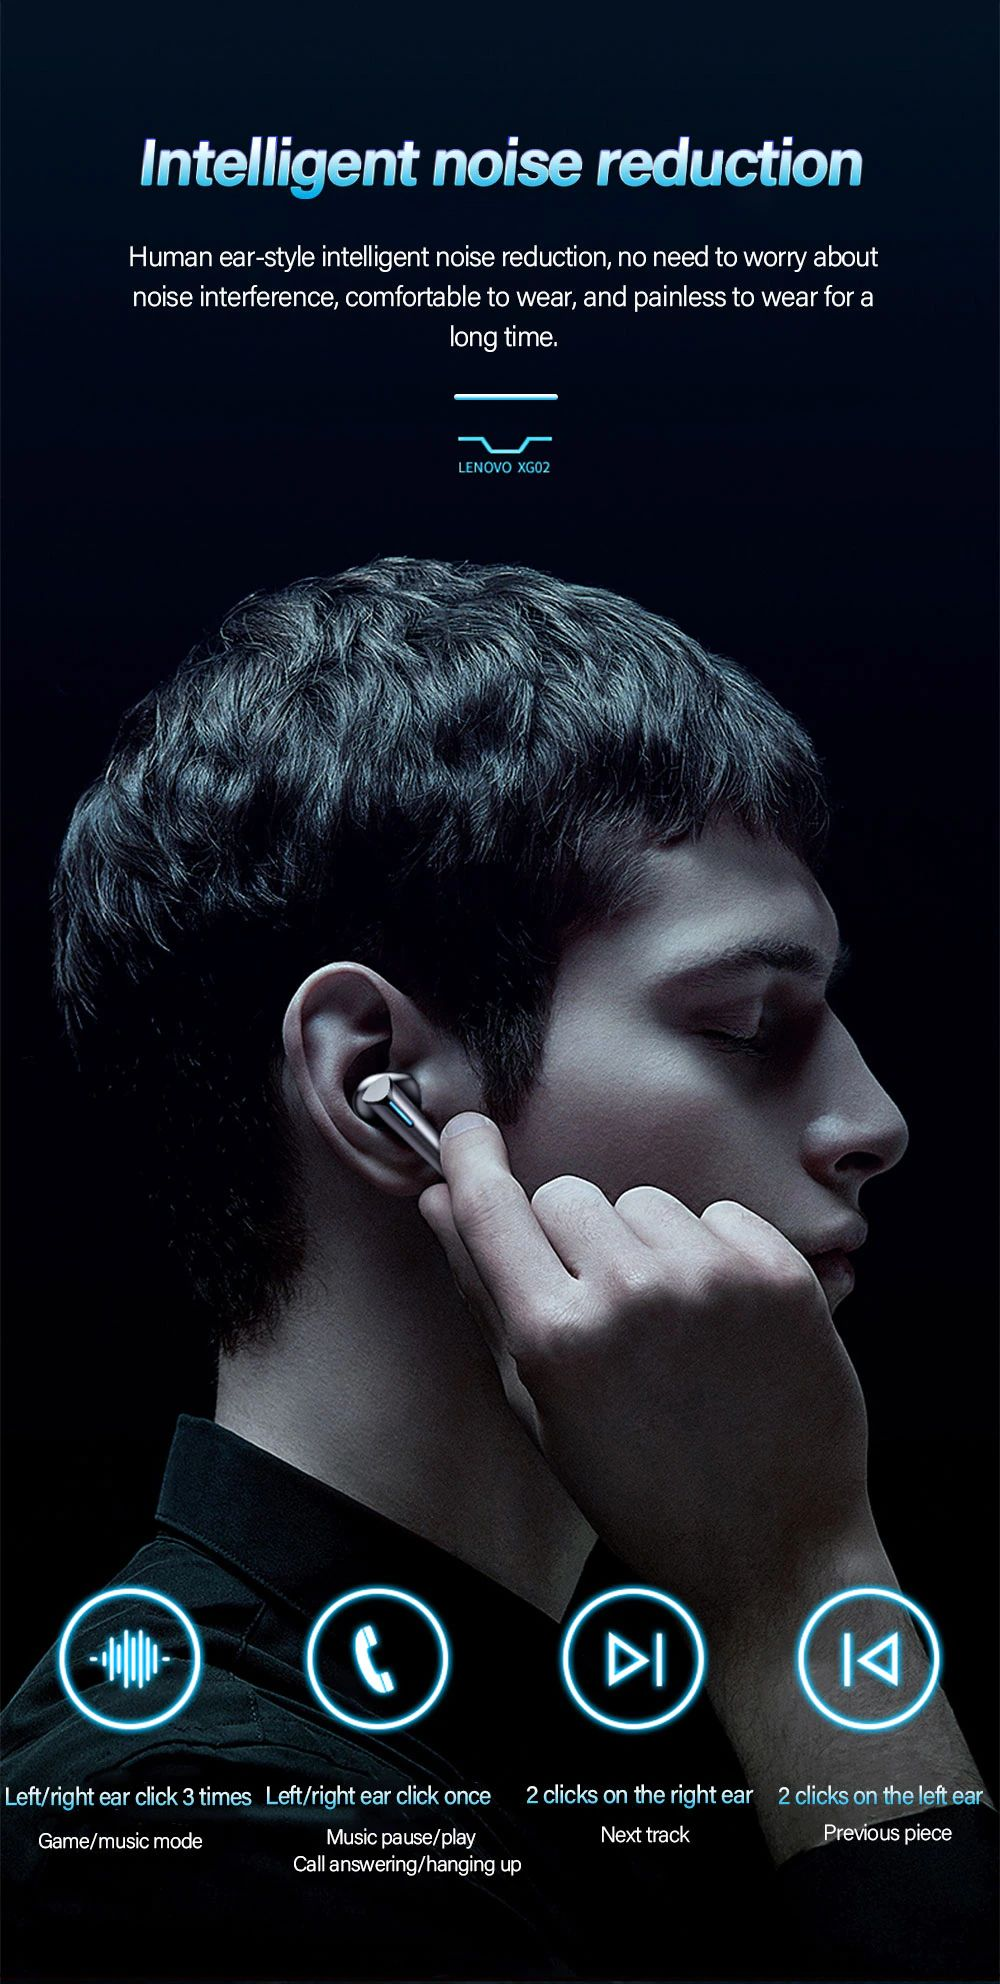 Lenovo Xg02 Wireless Bt5 0 Gaming Earbuds (3)